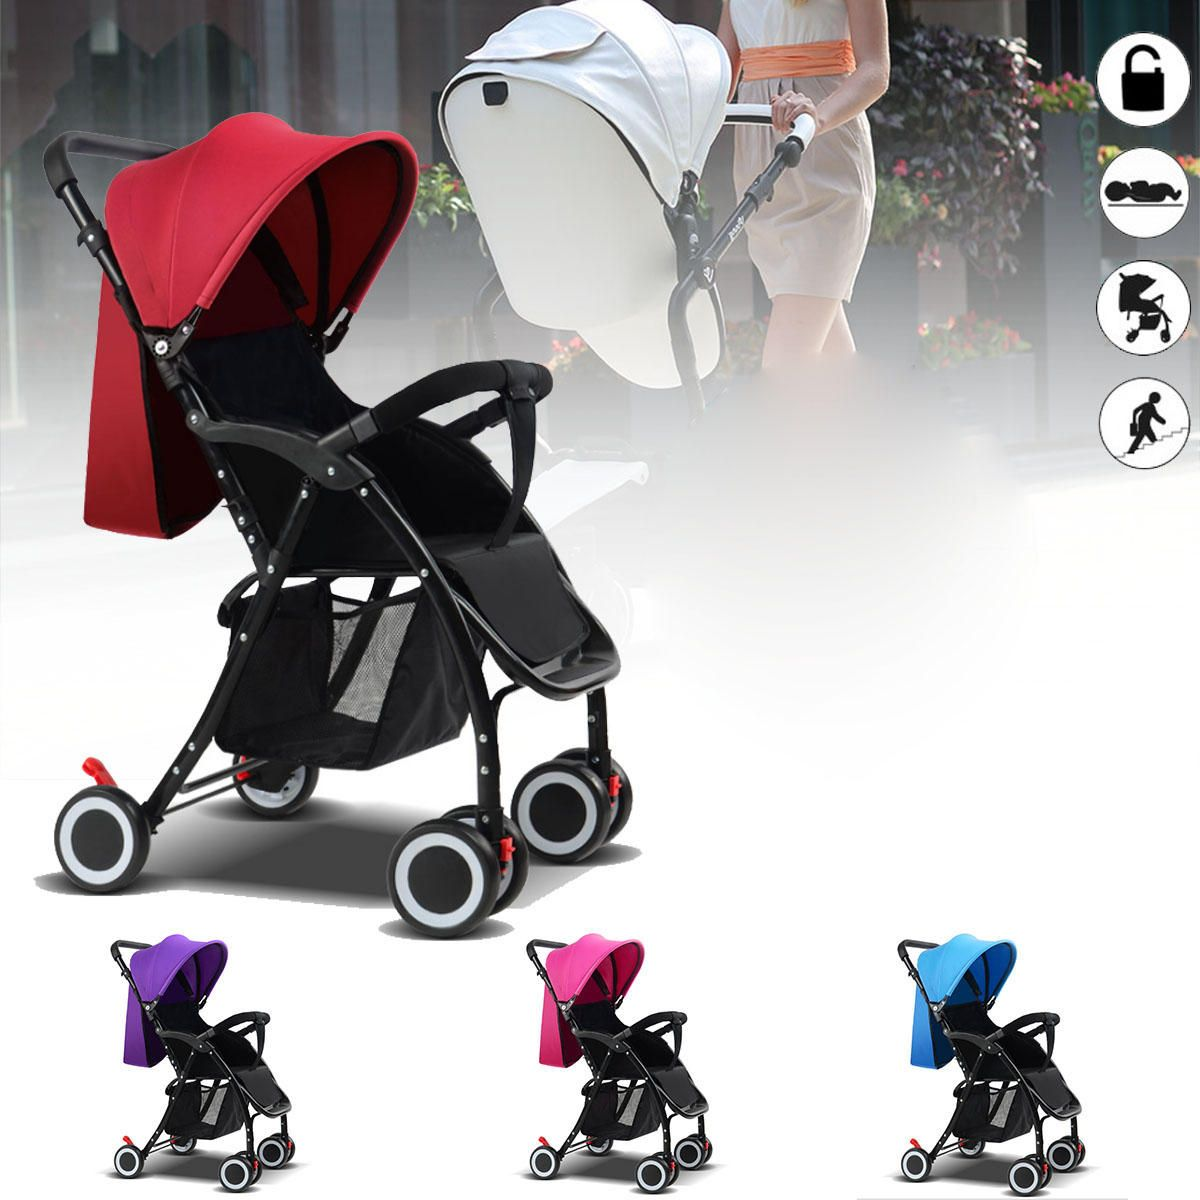 Foldable Baby Kids Travel Stroller Newborn Infant Pushchair Buggy Pram Lightweight Baby Carriage